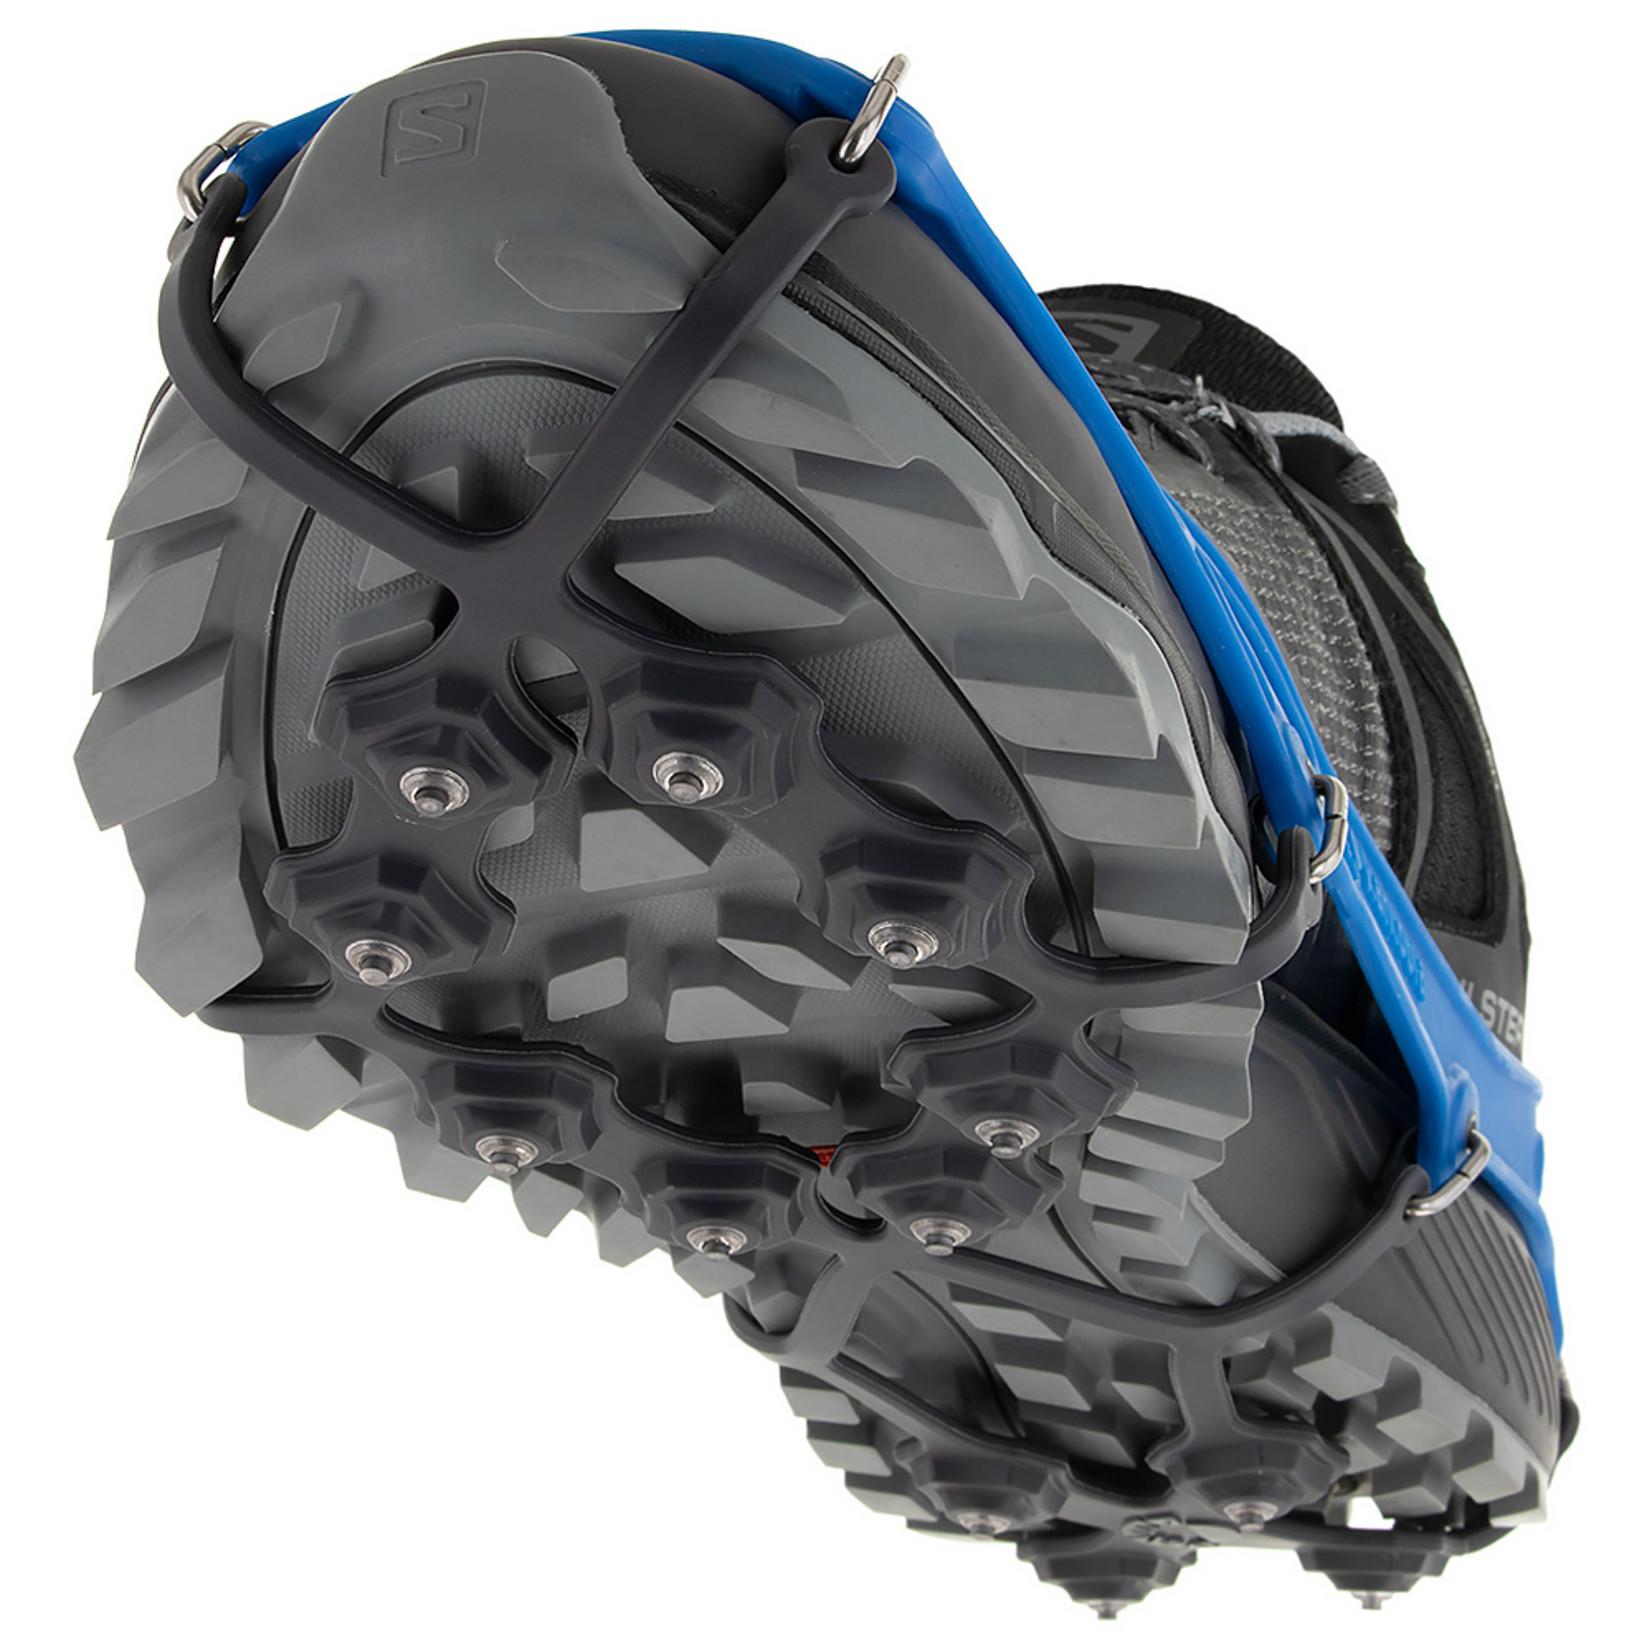 Kathoola EXOspikes™ Footwear Traction